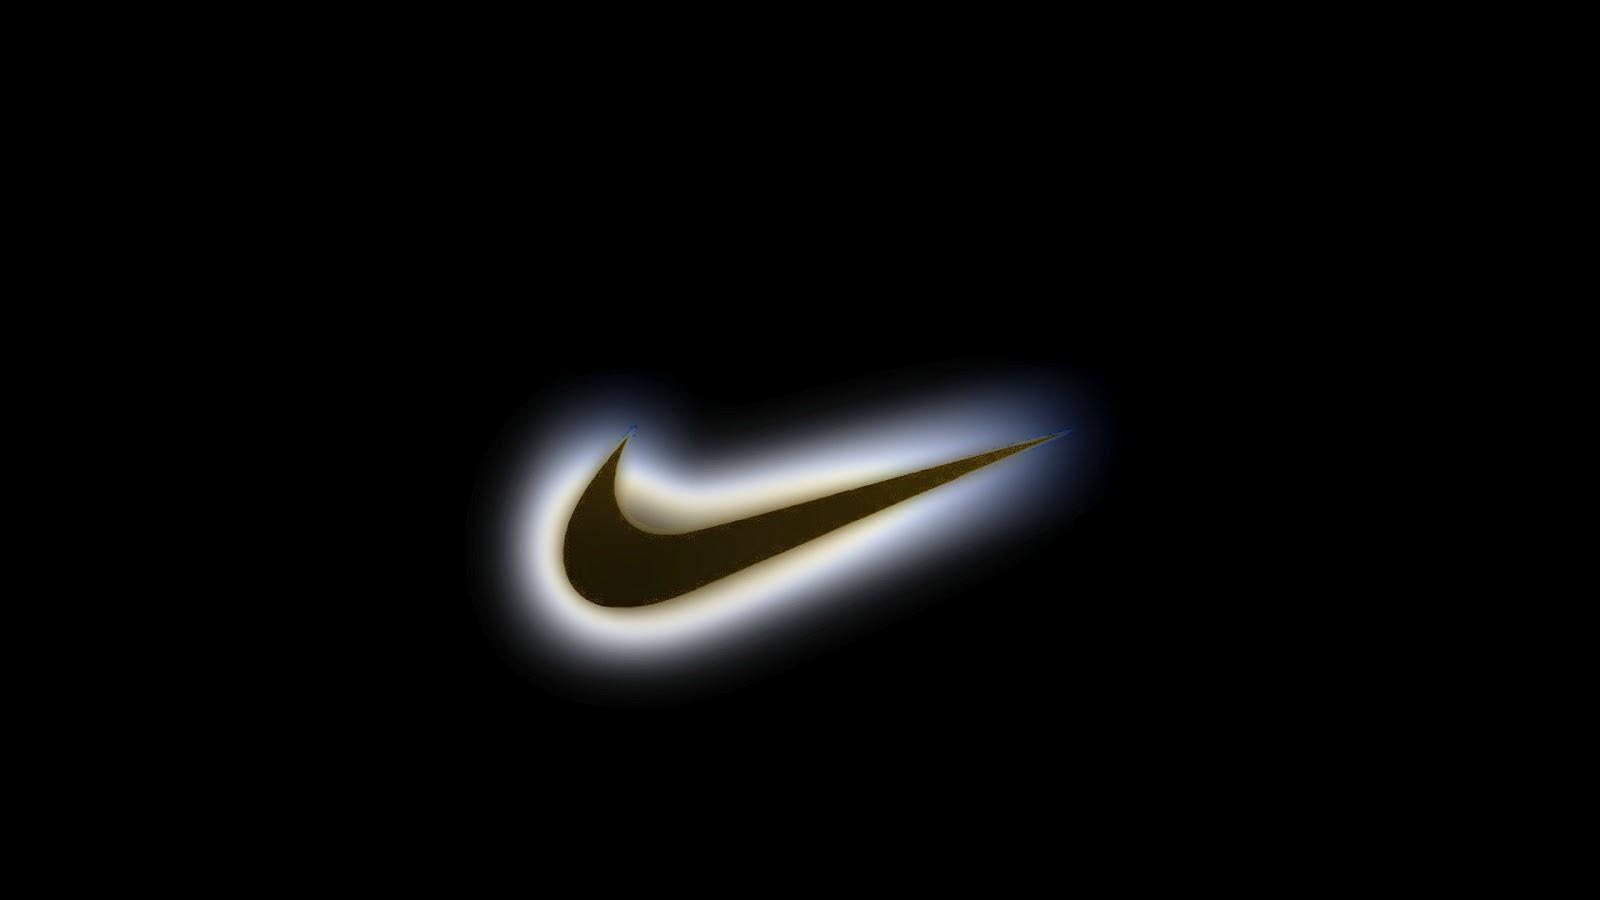 Nike Cool Logo 1081 1600x900 px ~ HDWallSource.com